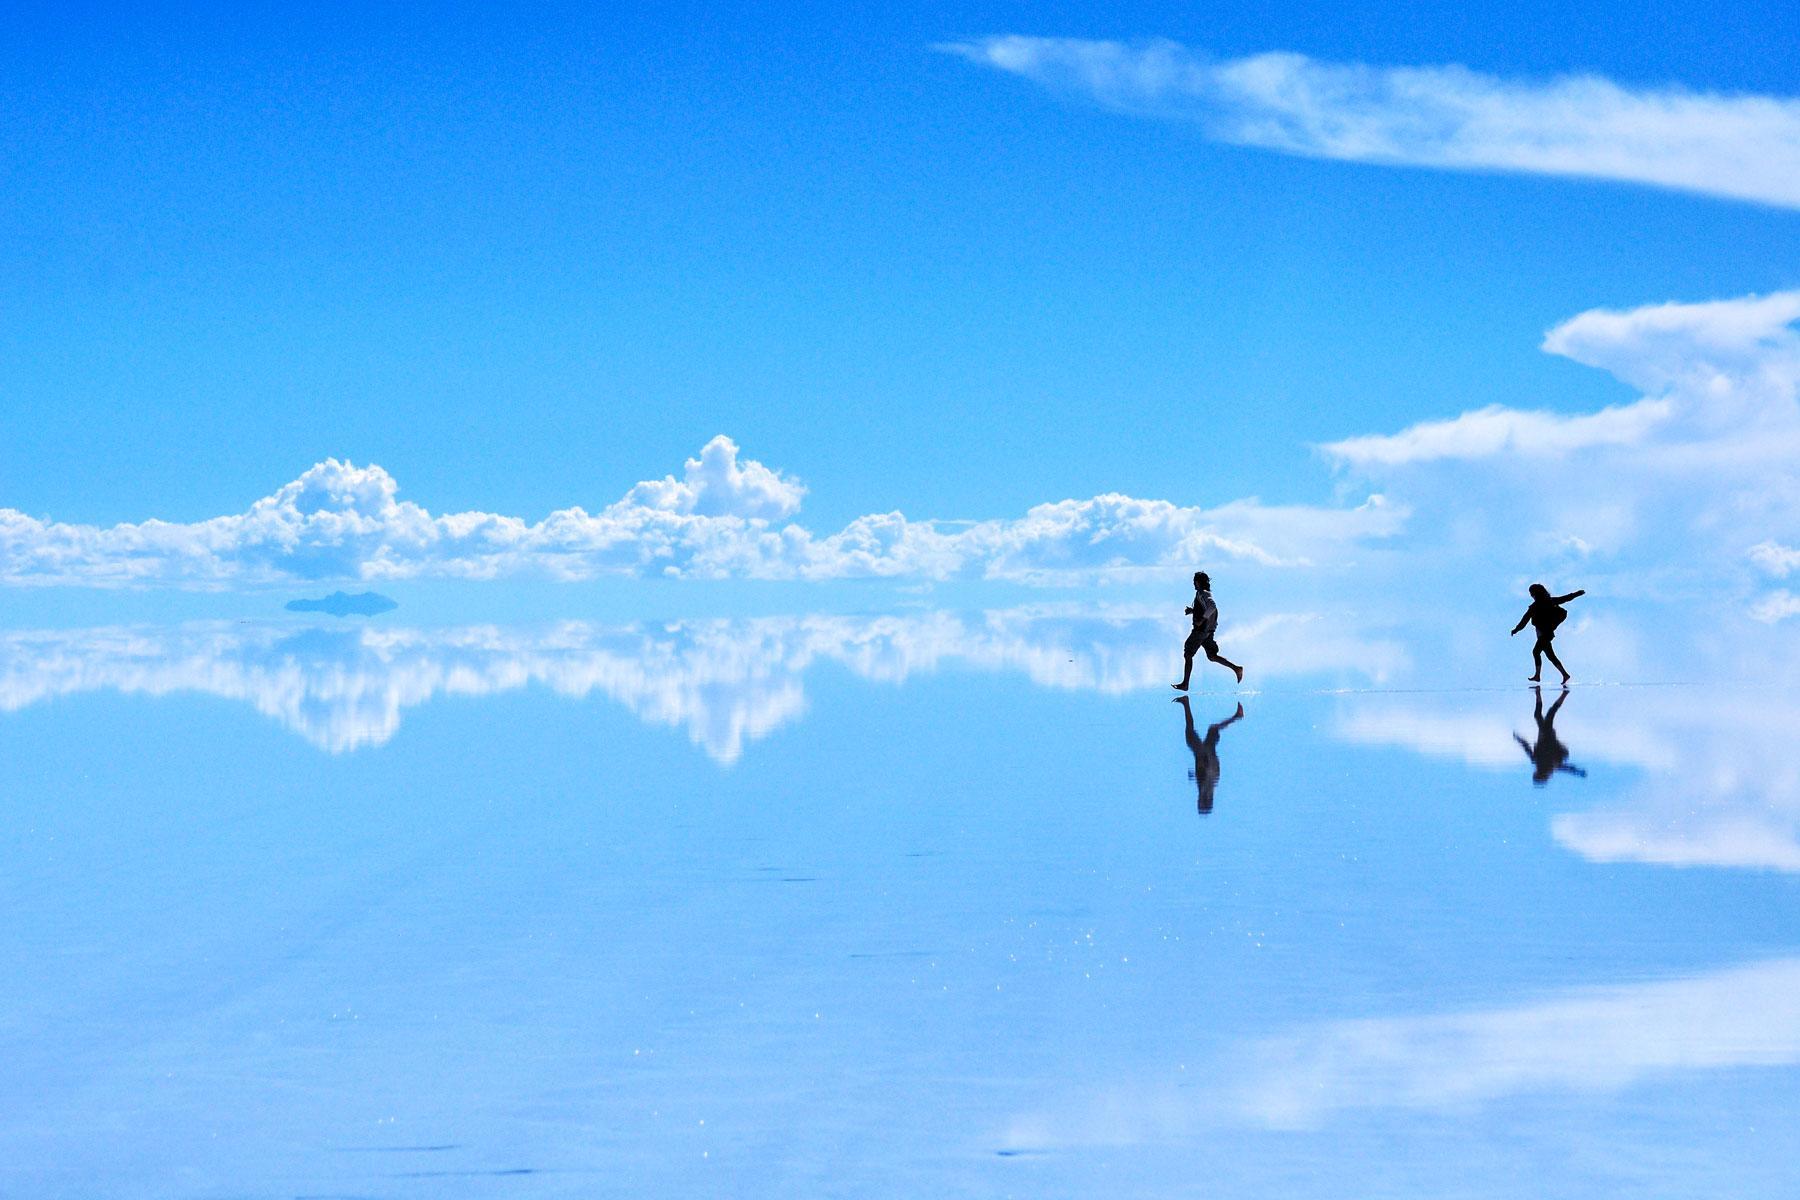 Psychedelic Images of Salar de Uyuni, South America's Most Surreal Landscape